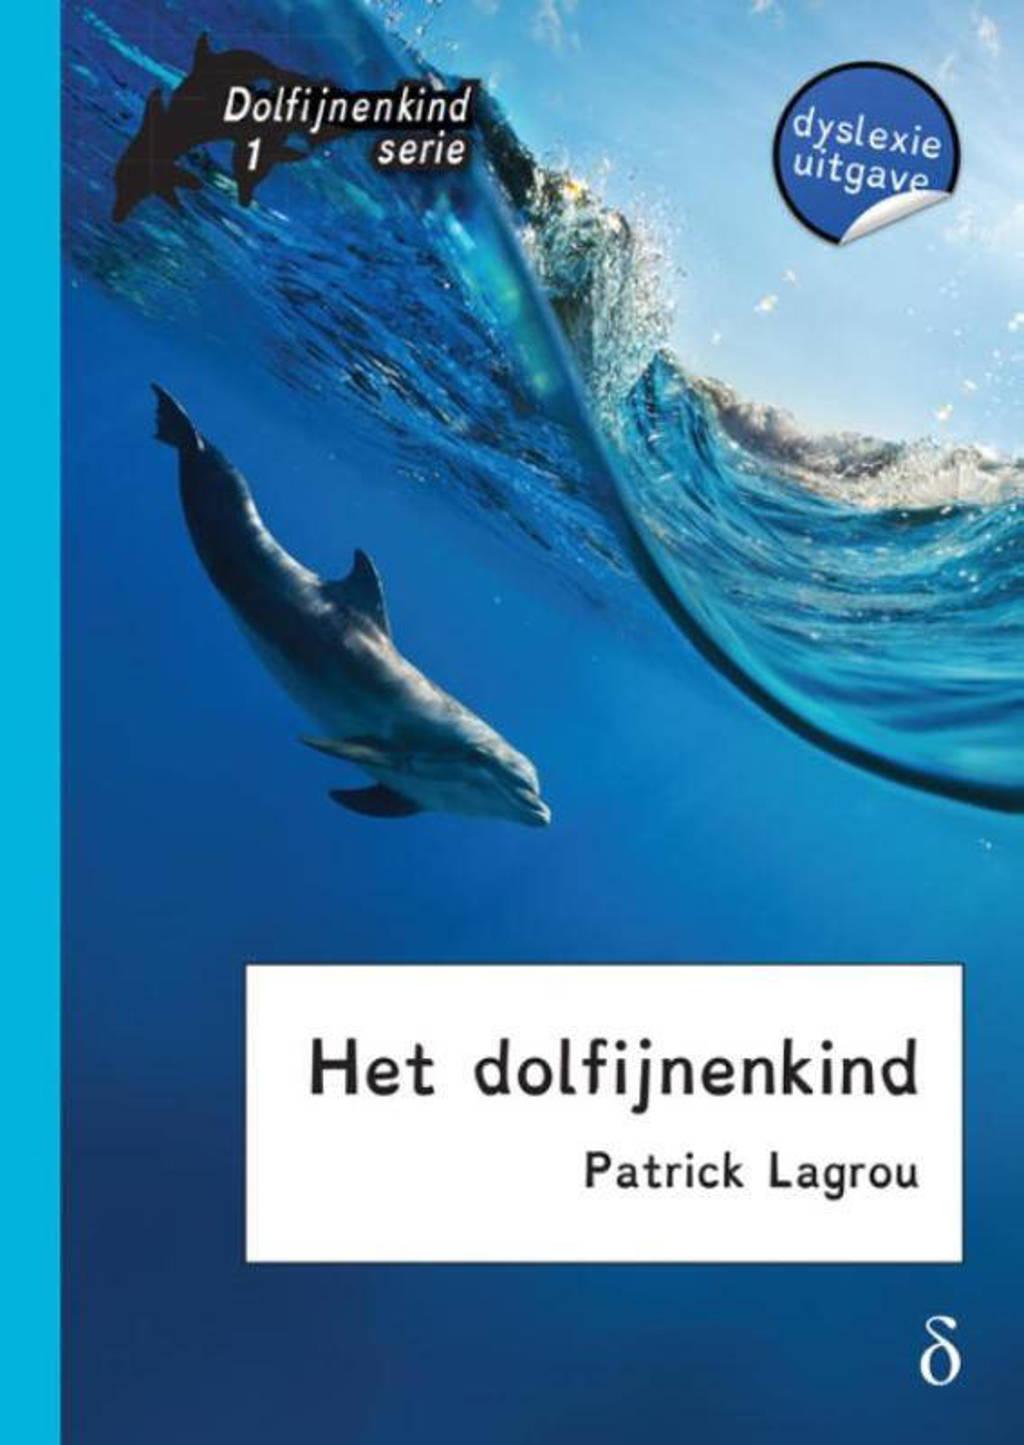 Dolfijnenkind: Het dolfijnenkind - Patrick Lagrou